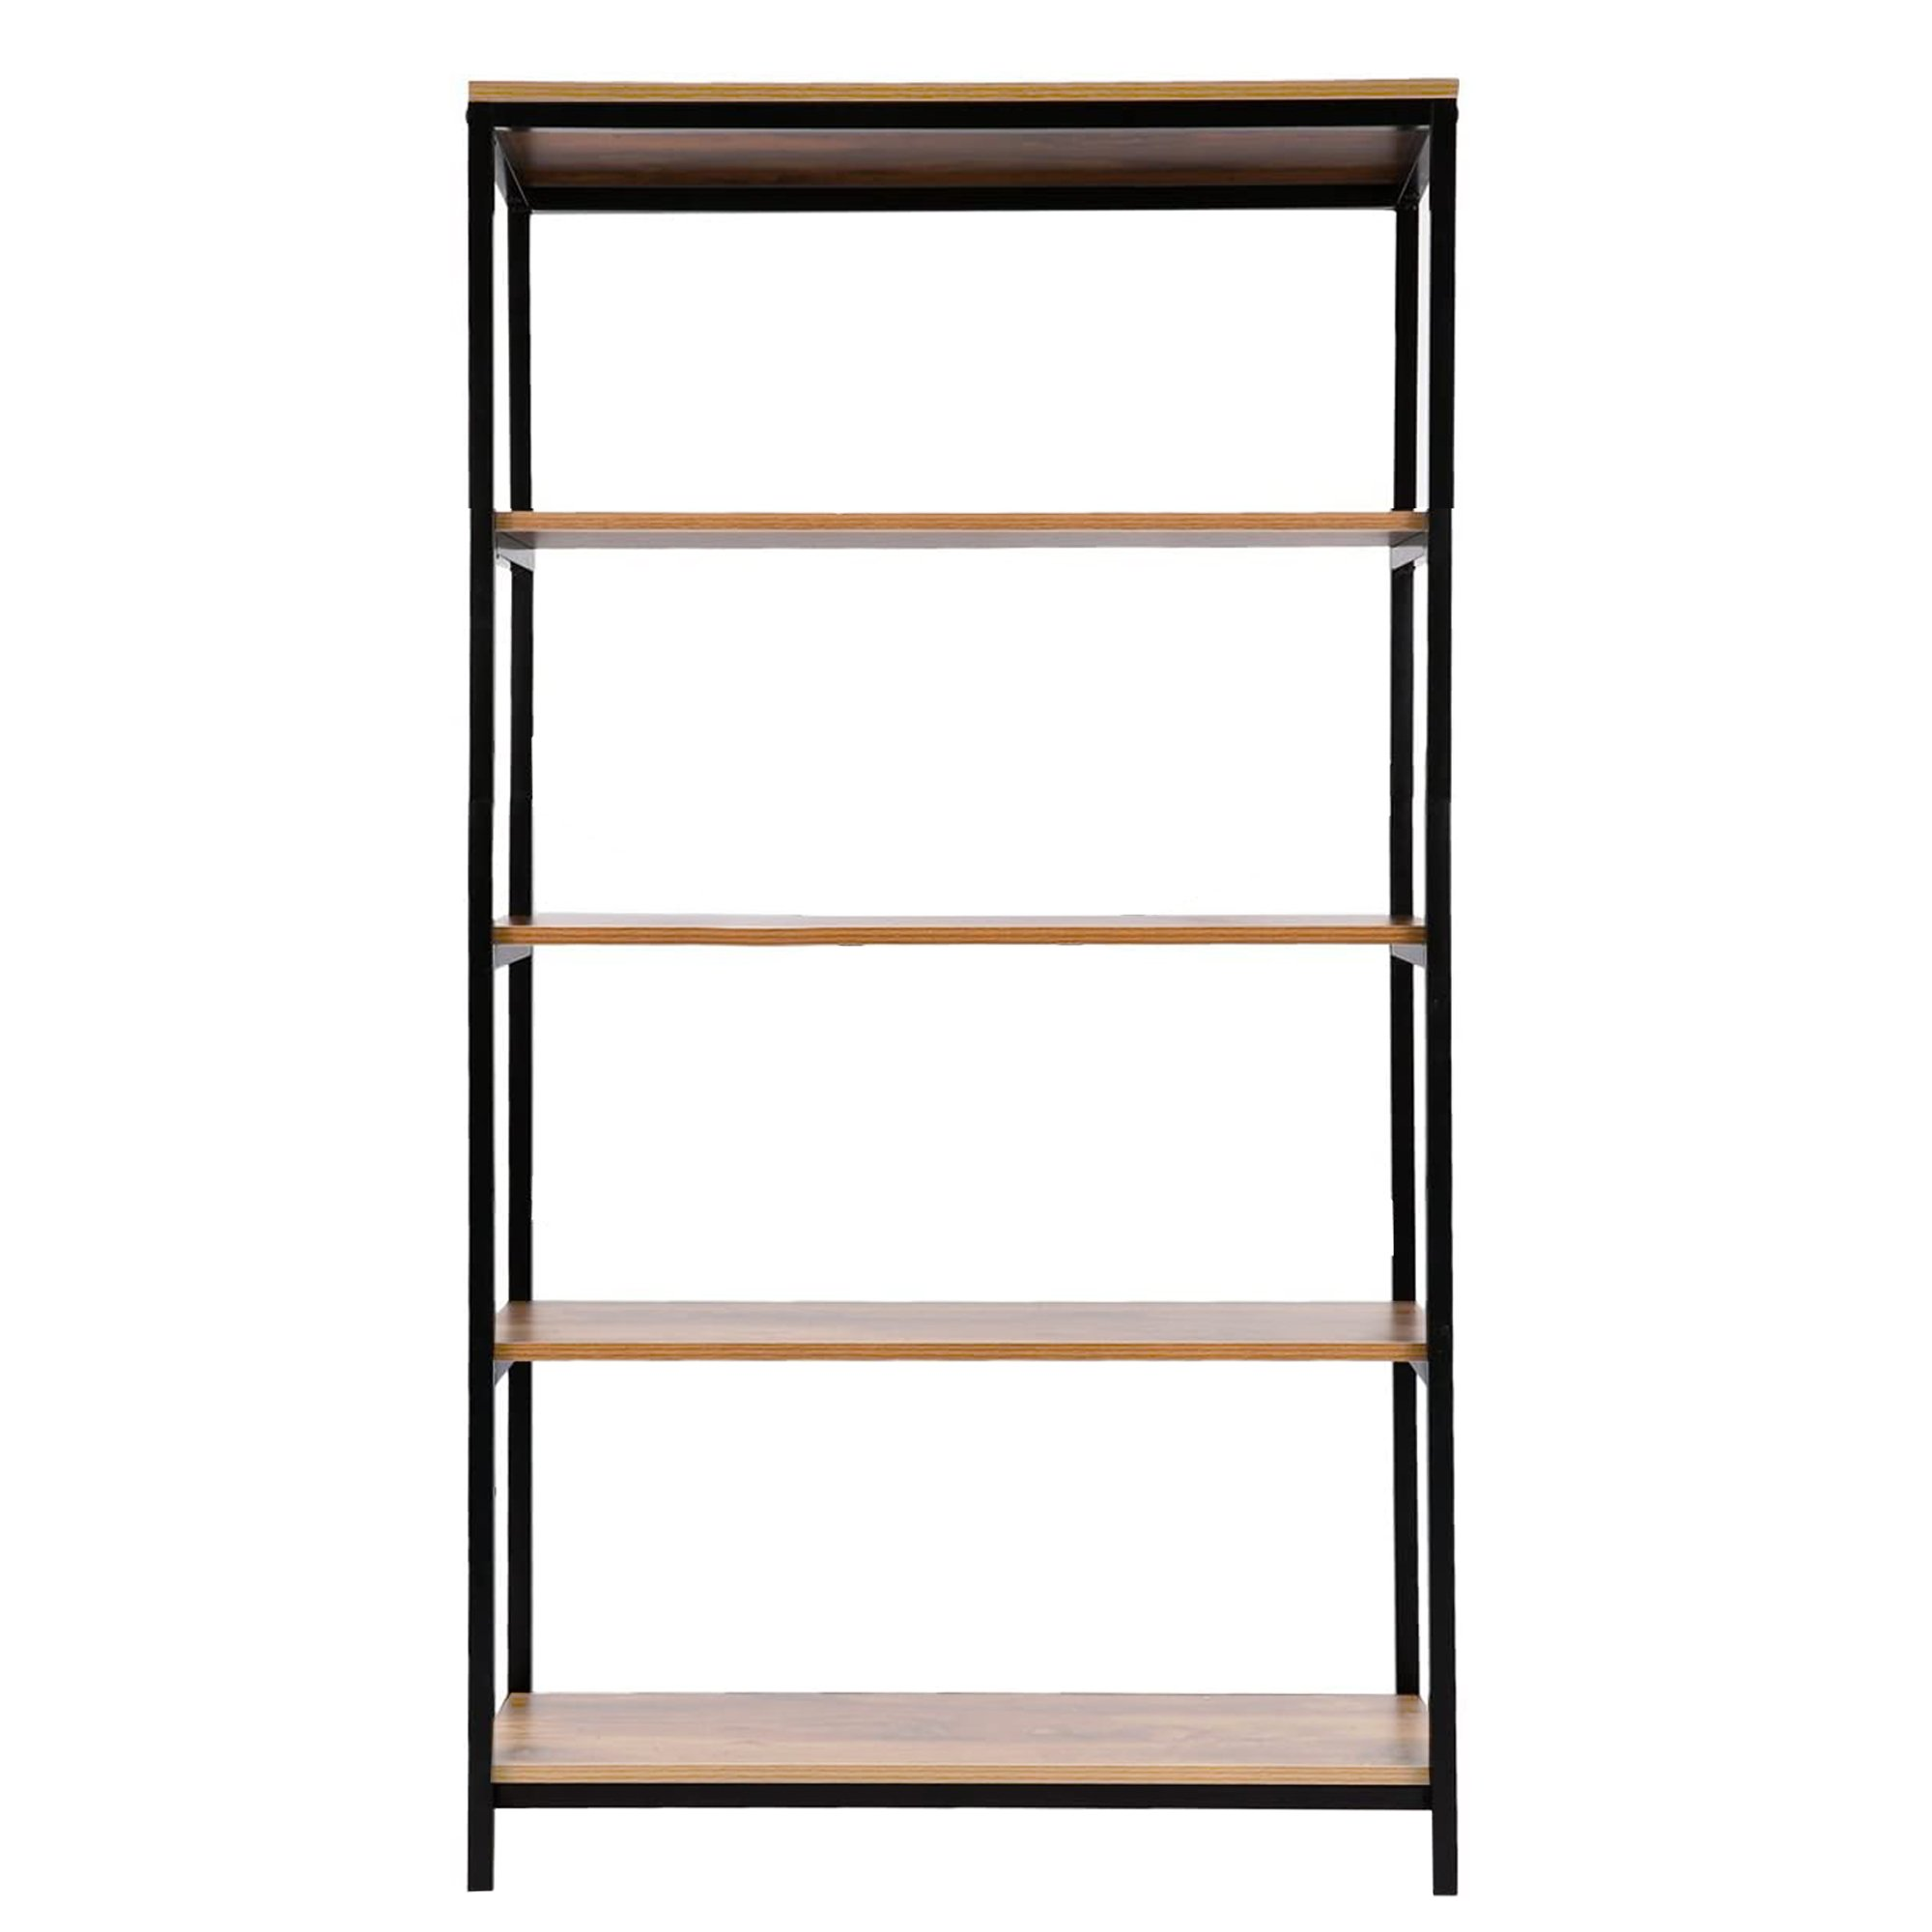 Industrial Style Bookshelf Display Shelves